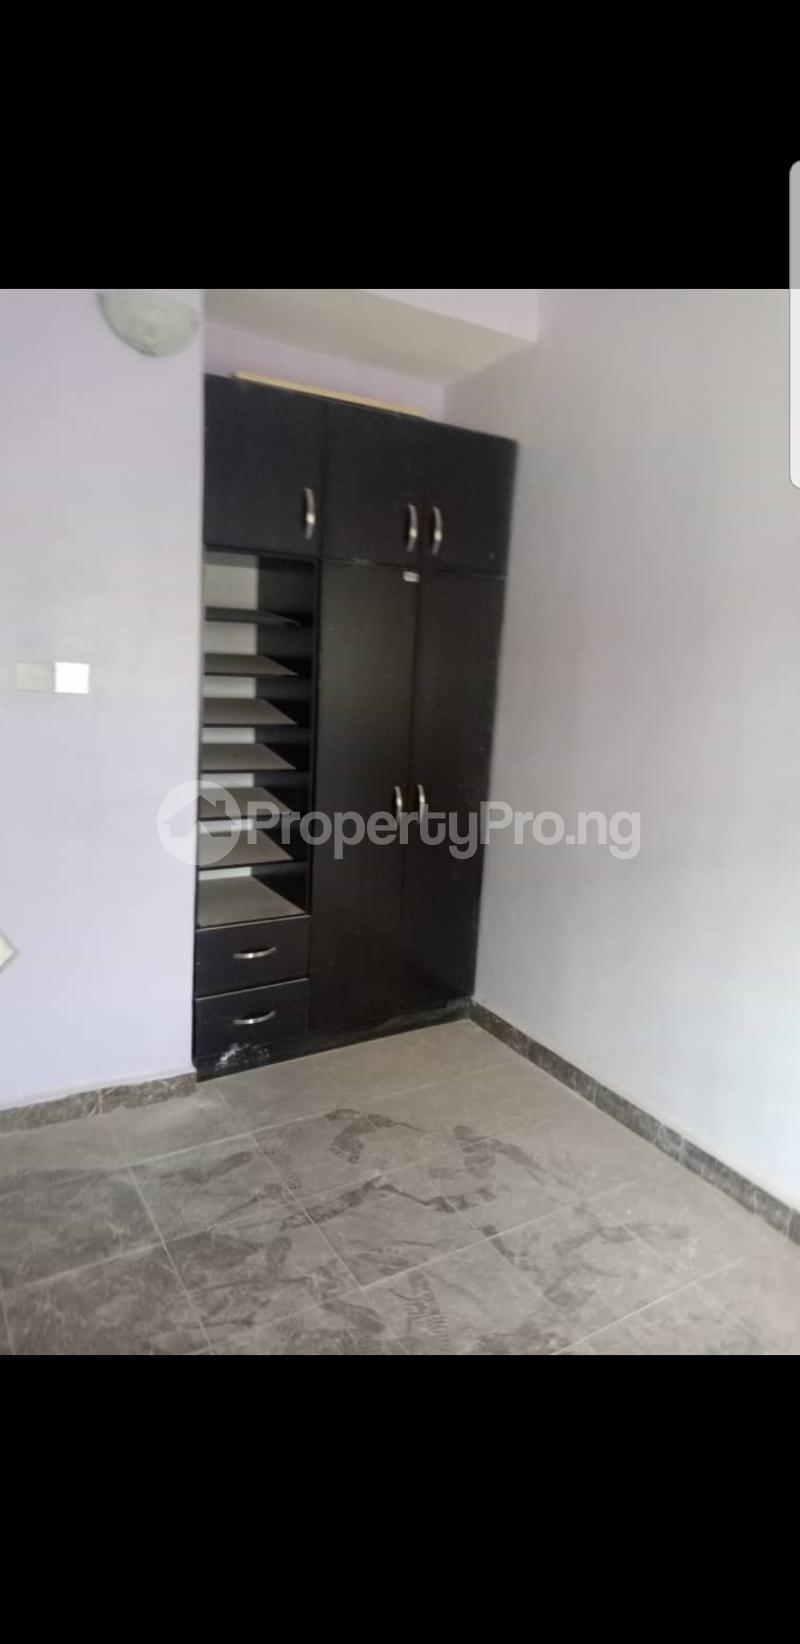 3 bedroom Shared Apartment Flat / Apartment for rent Enugu Enugu - 0